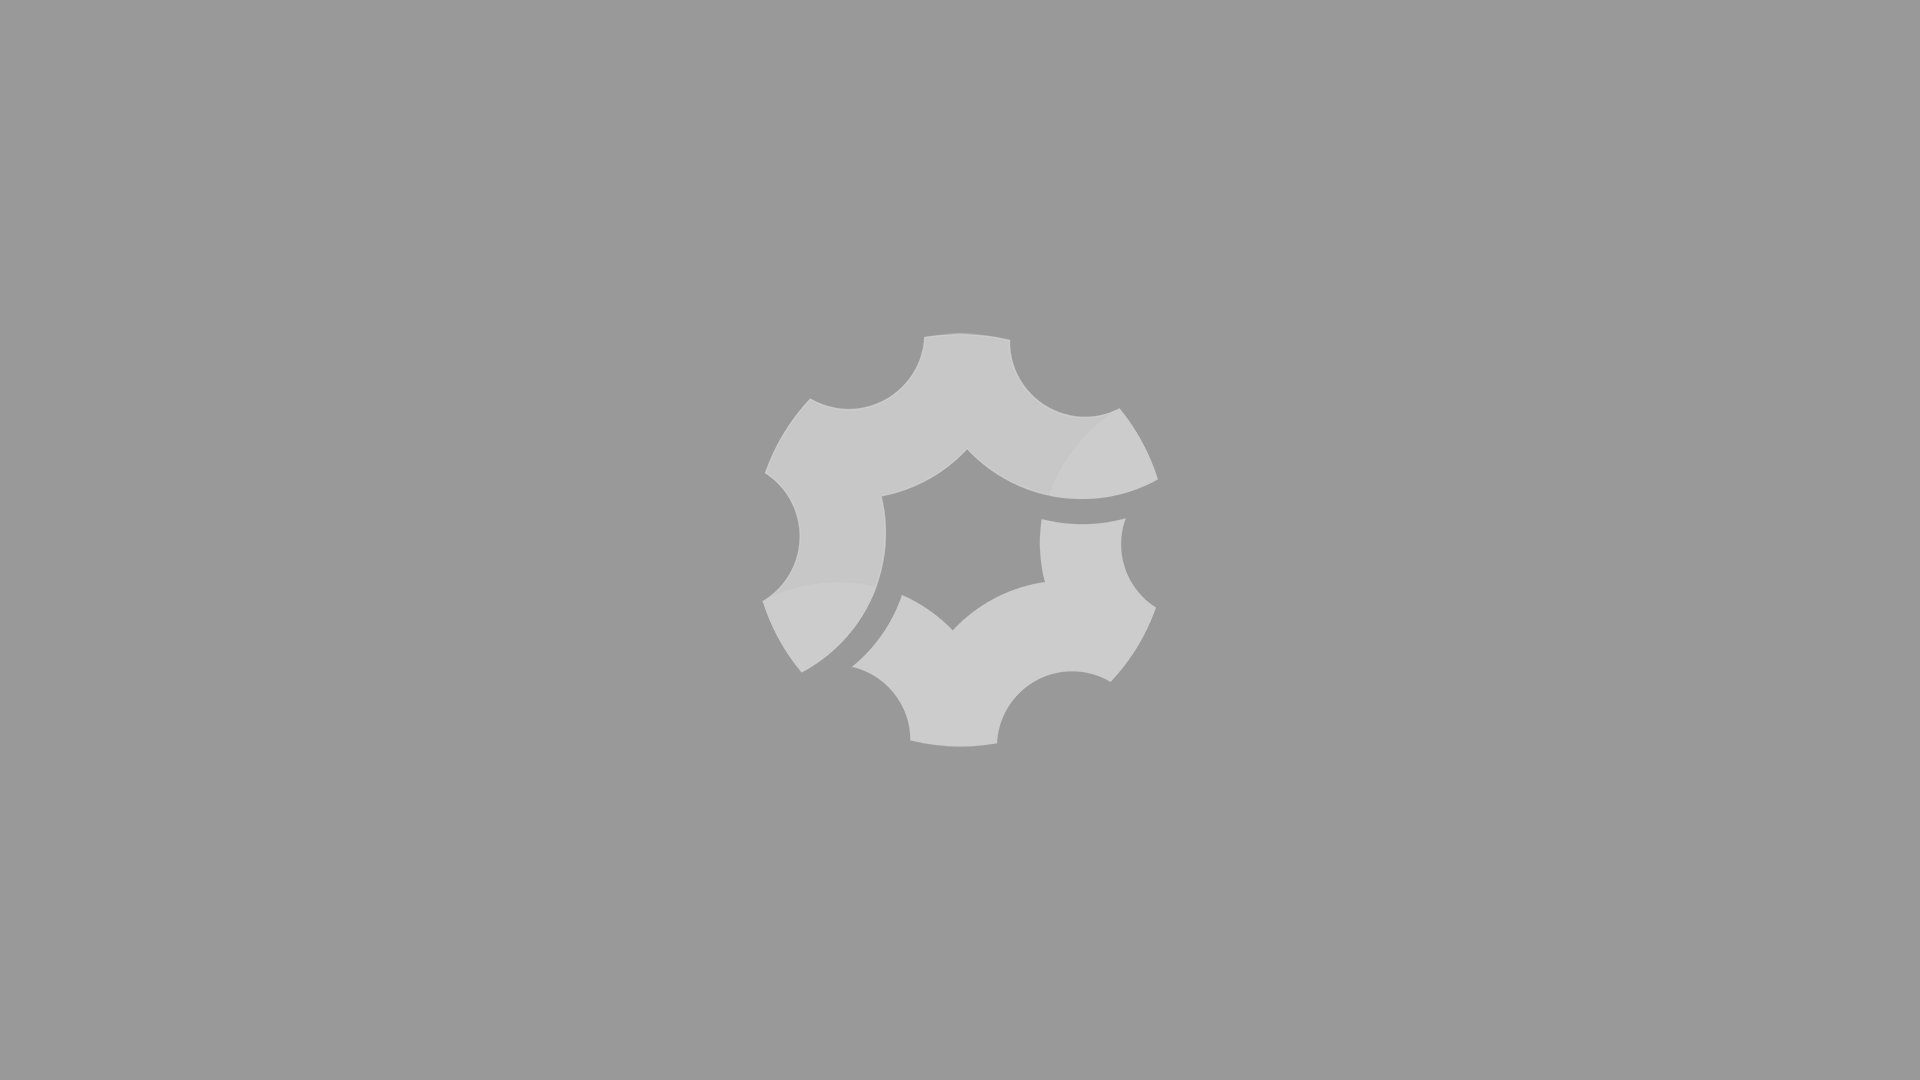 skaterxl_21.02.2021_16_35_38.1.png